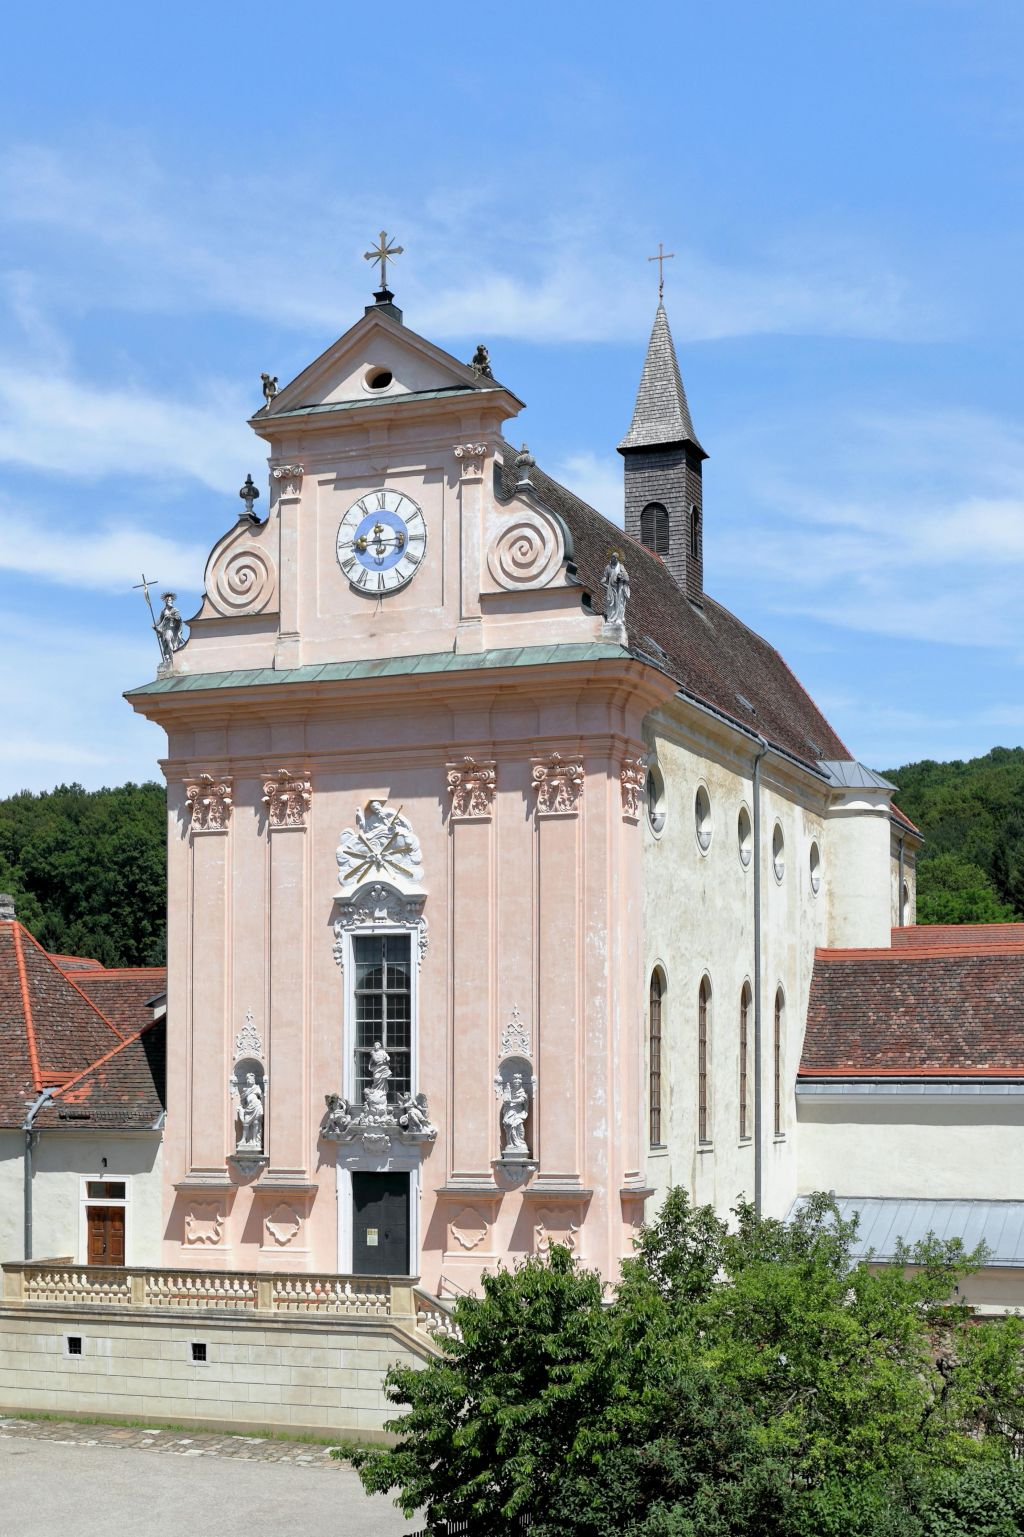 Klosterkirche der Kartause Mauerbach (c) BwagCC-BY-SA-4.0 (Schlosspark Mauerbach)